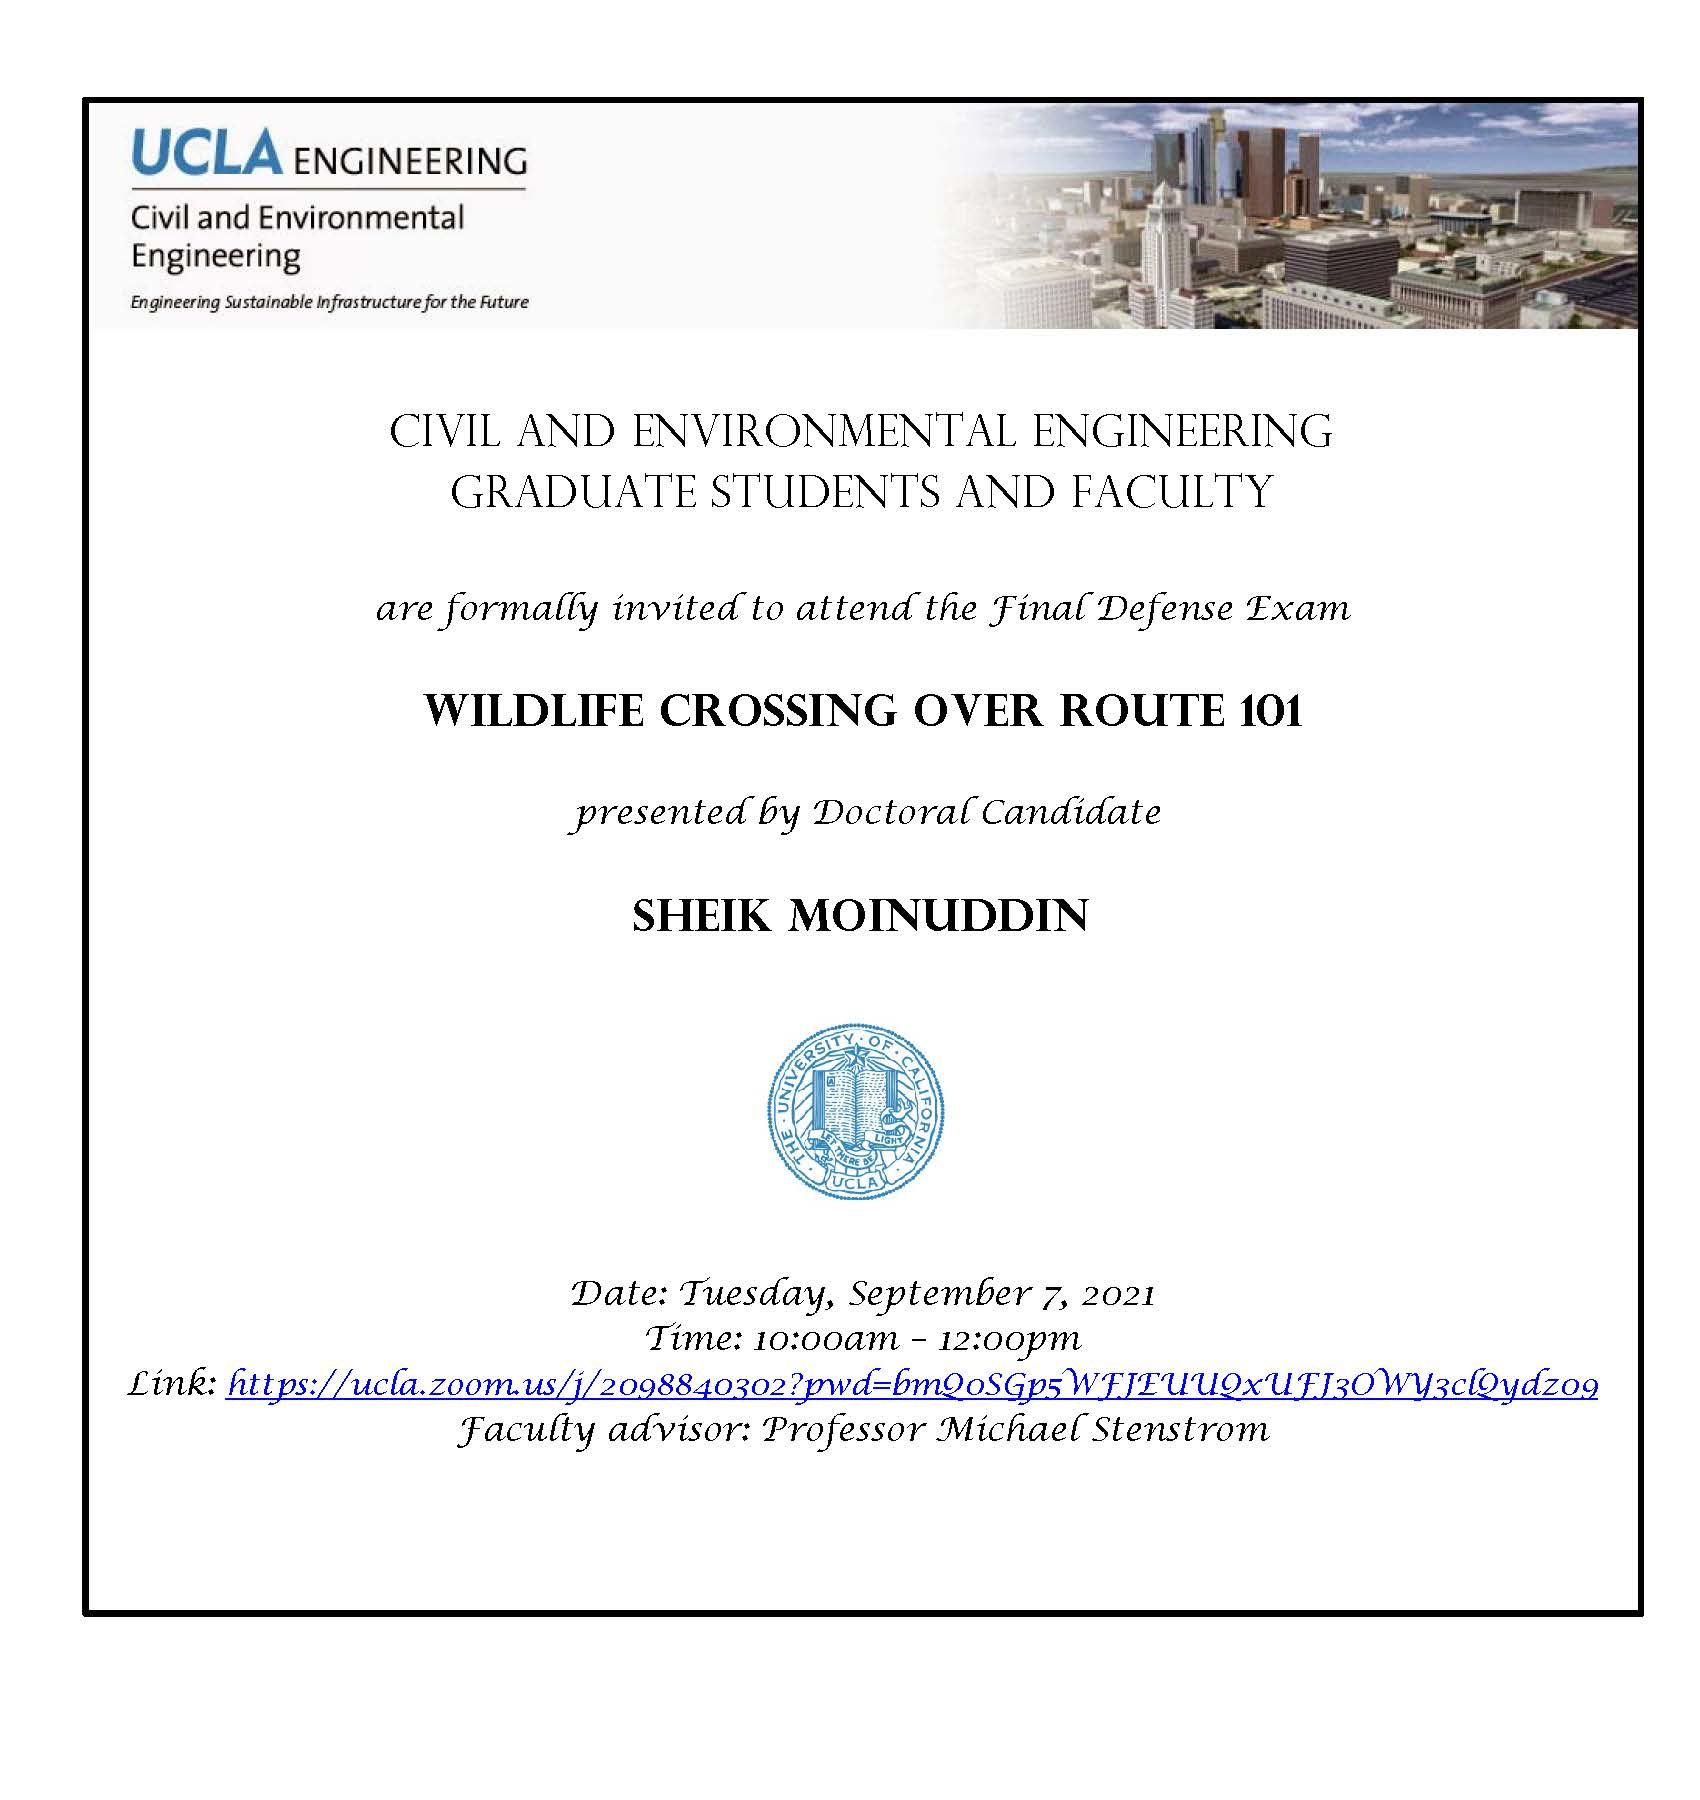 Defense Exam: Sheik Moinuddin